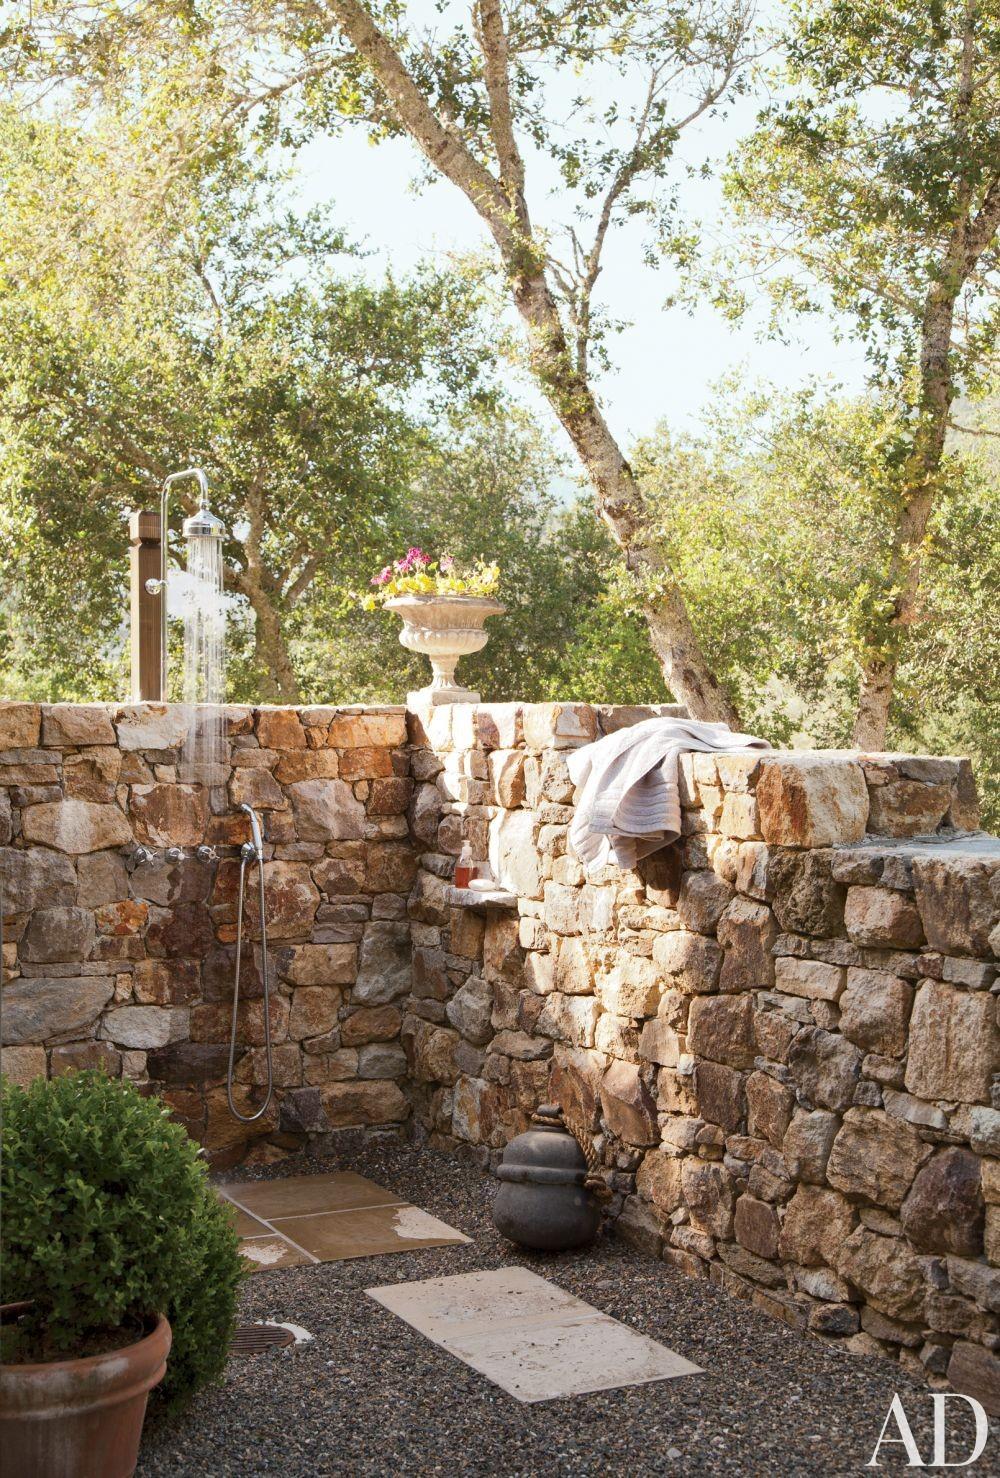 Rustic Bathroom by Rela Gleason and McAlpine Tankersley Architecture in Calistoga, California